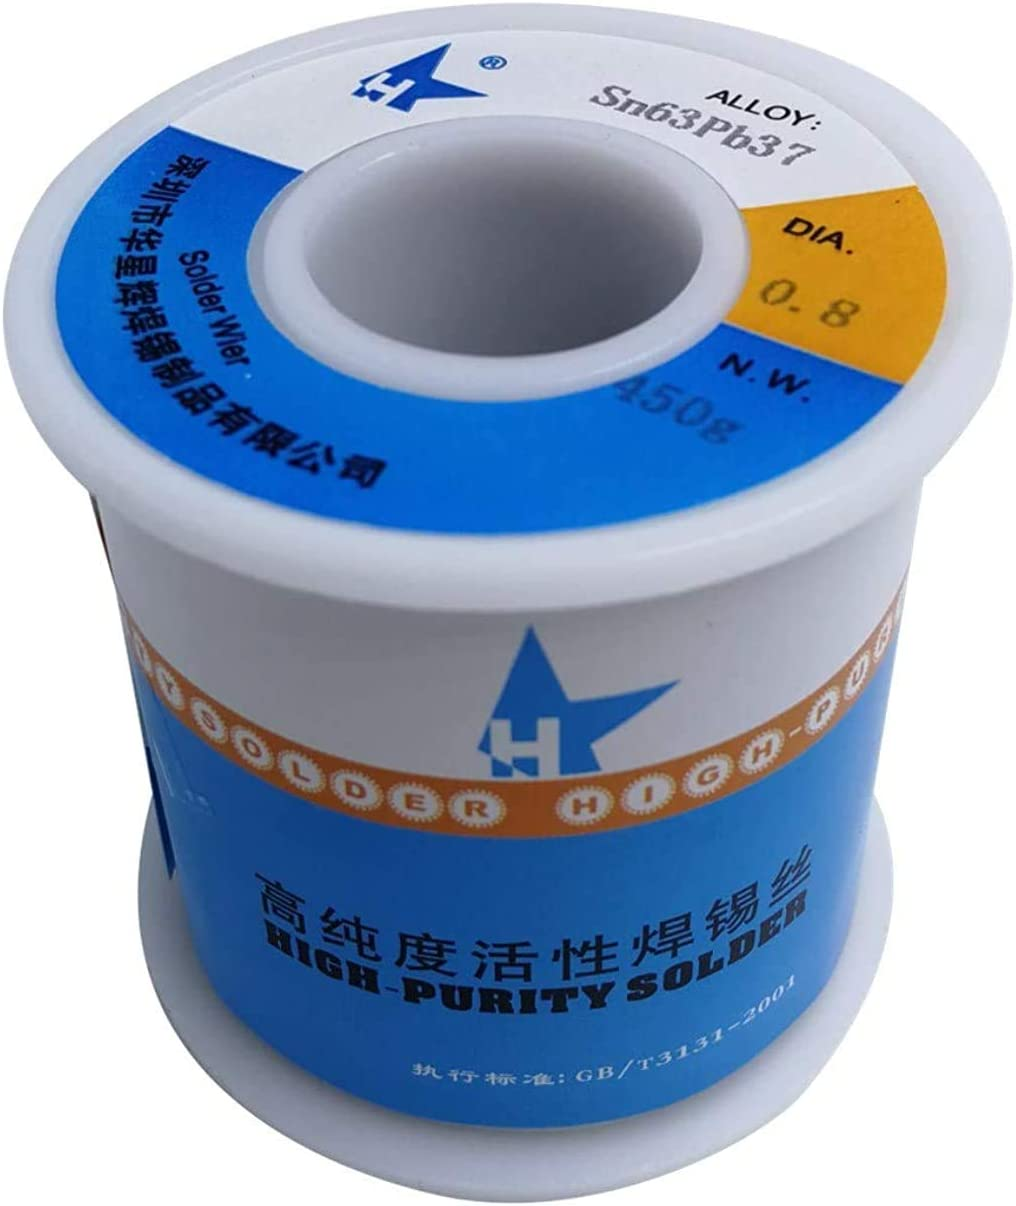 Sn63Pb37 Solder Wire Very popular 63 37 Tin Lead with Ele Superlatite Core Flux for Rosin